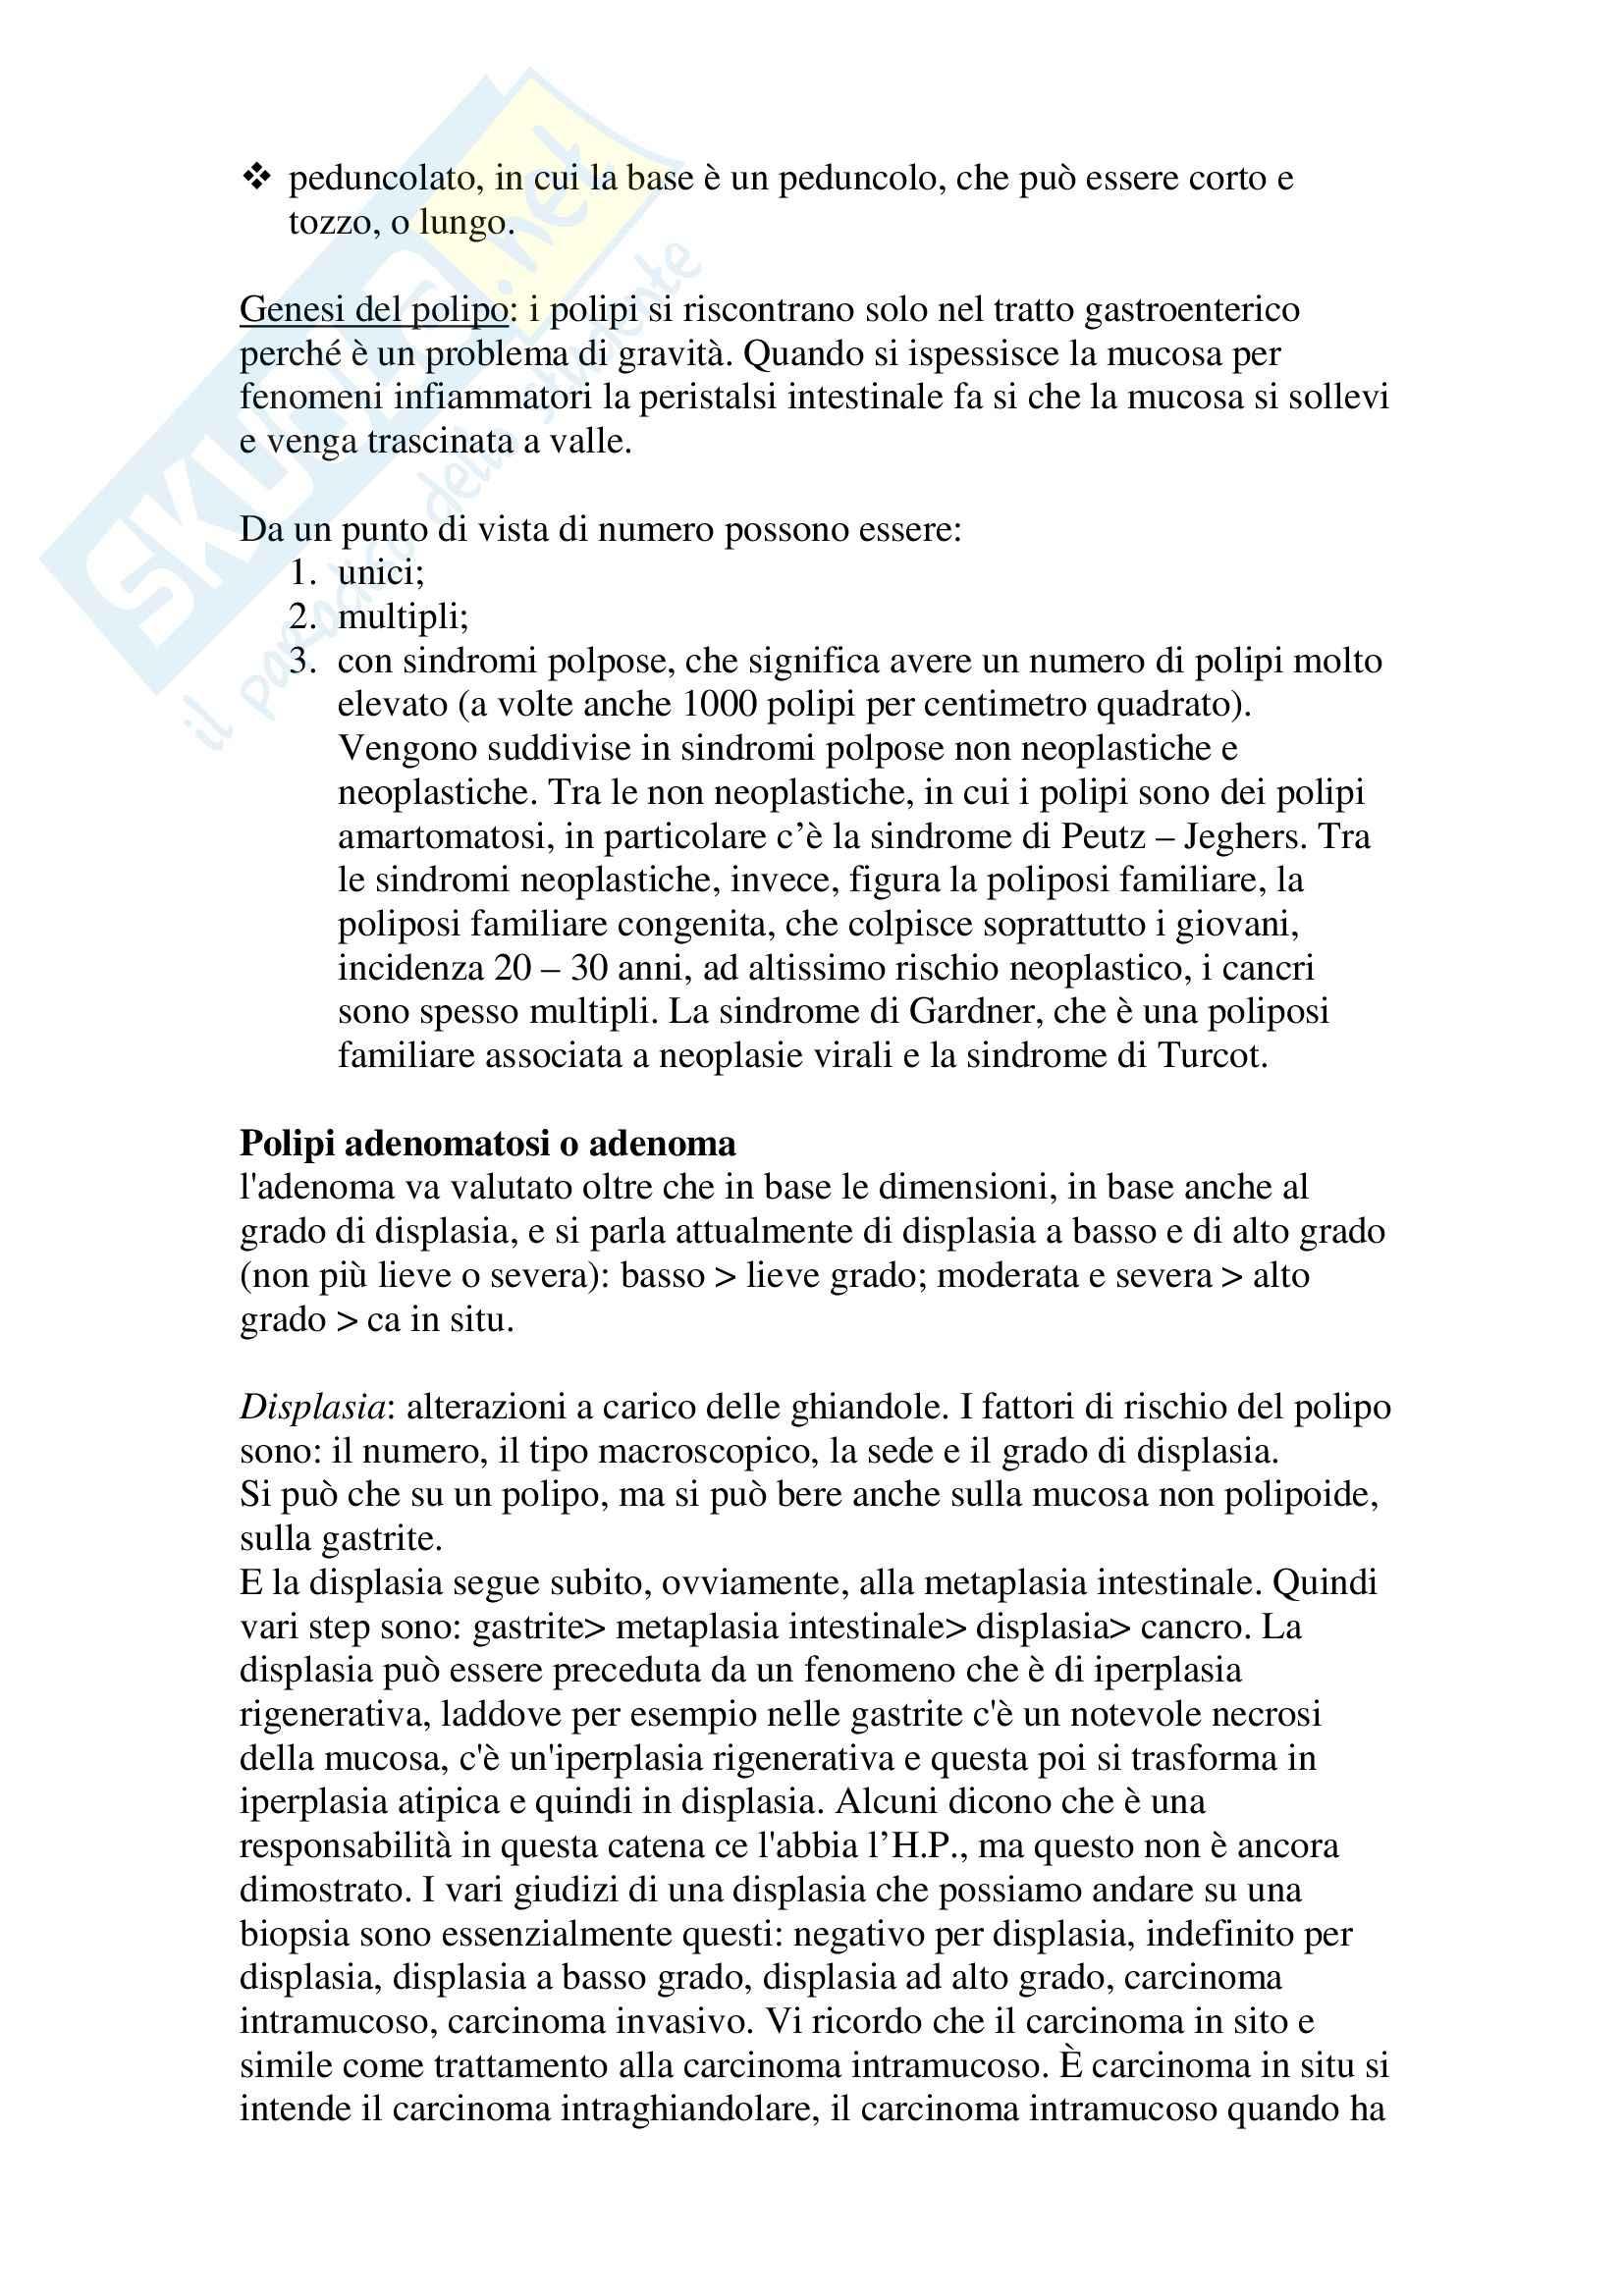 Anatomia patologica - iperplasia epiteliale Pag. 6